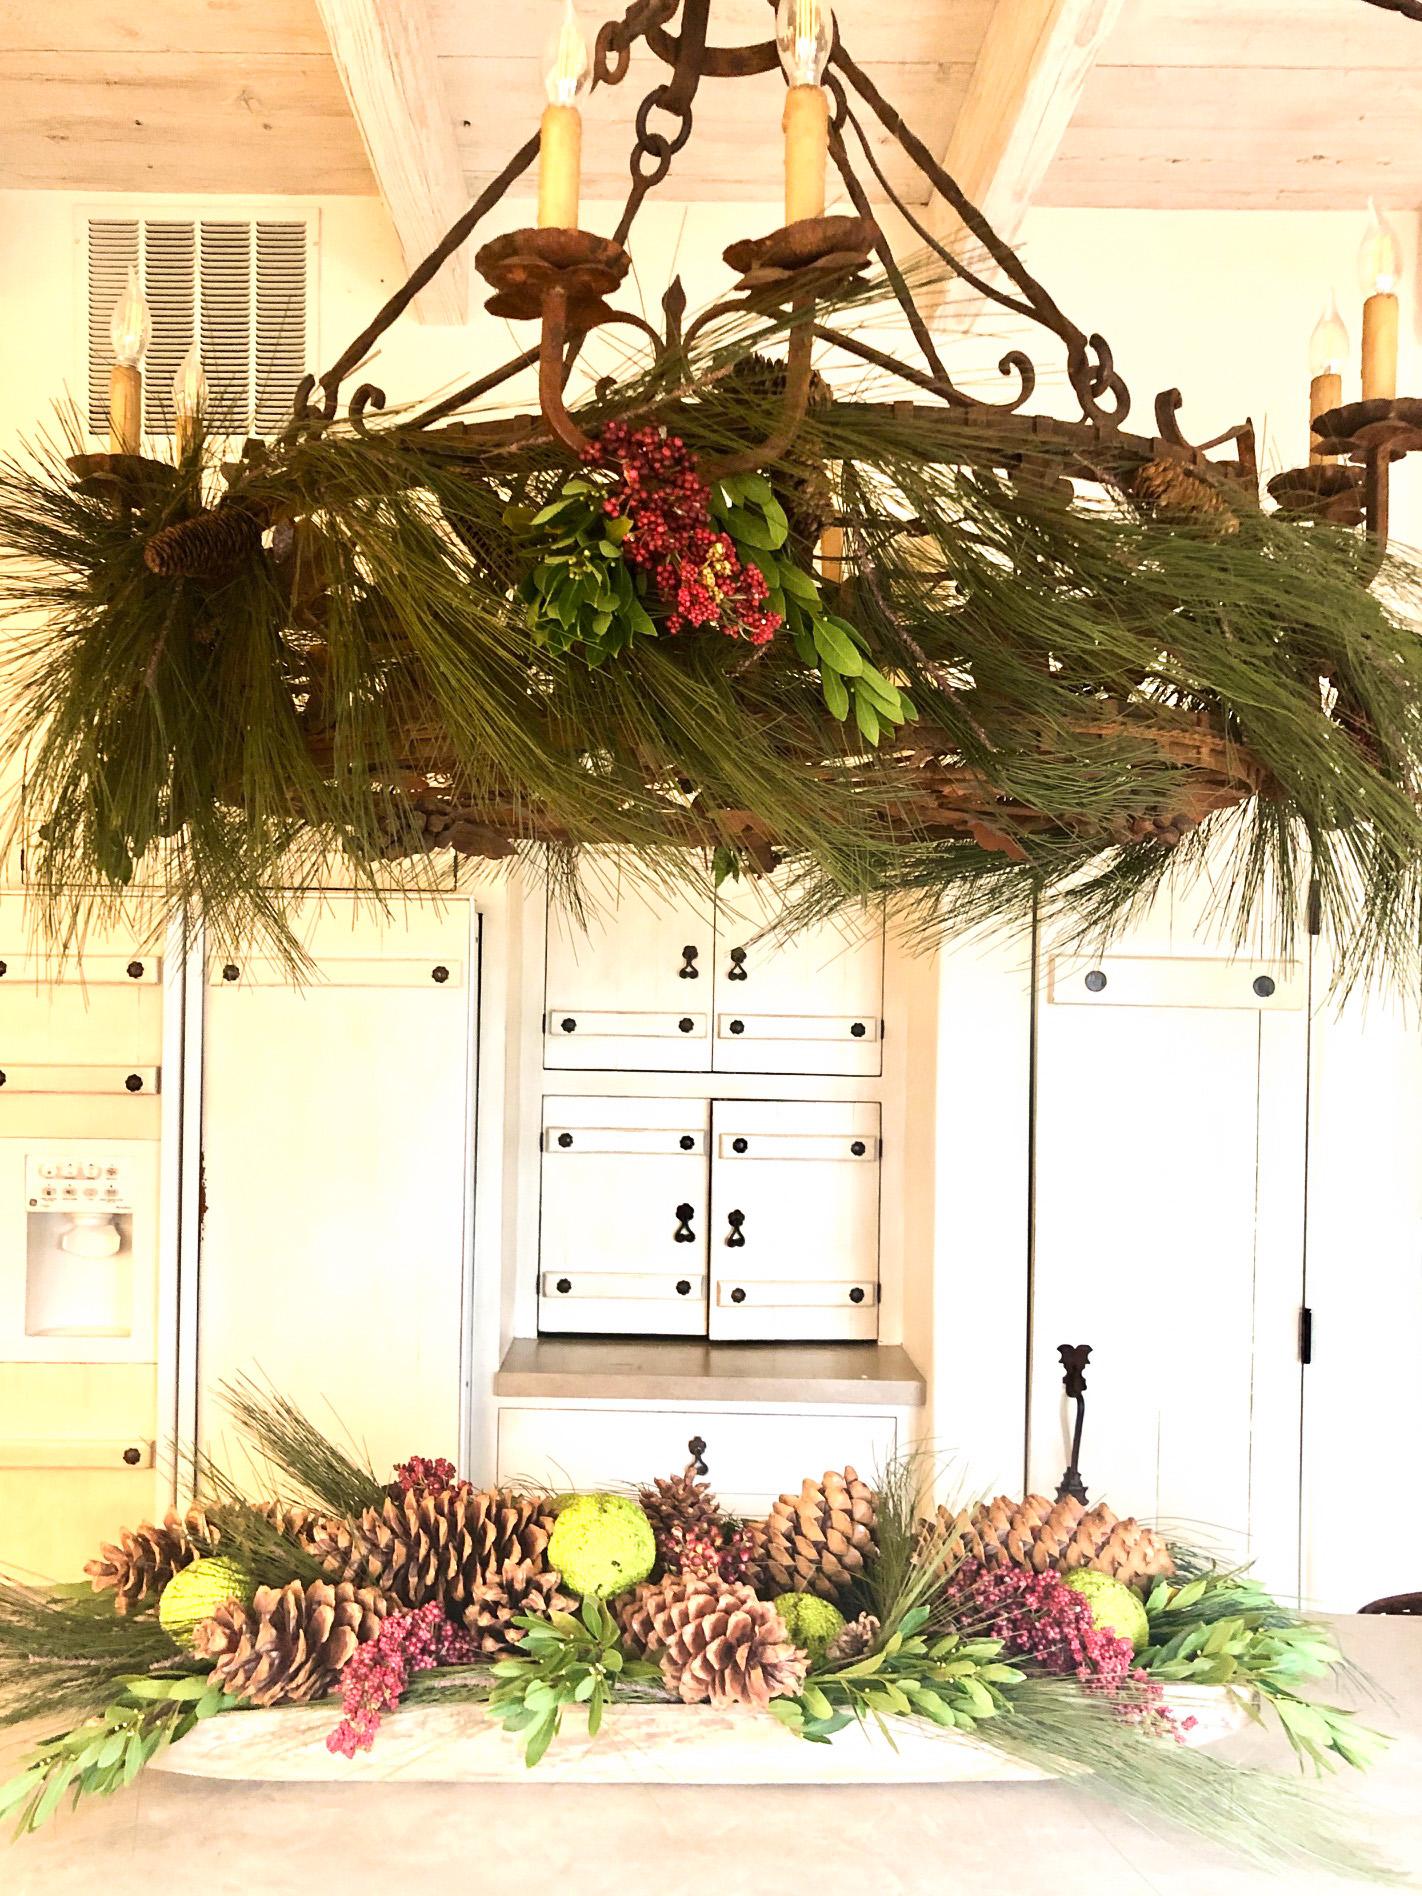 cindy hattersley kitchen christmas